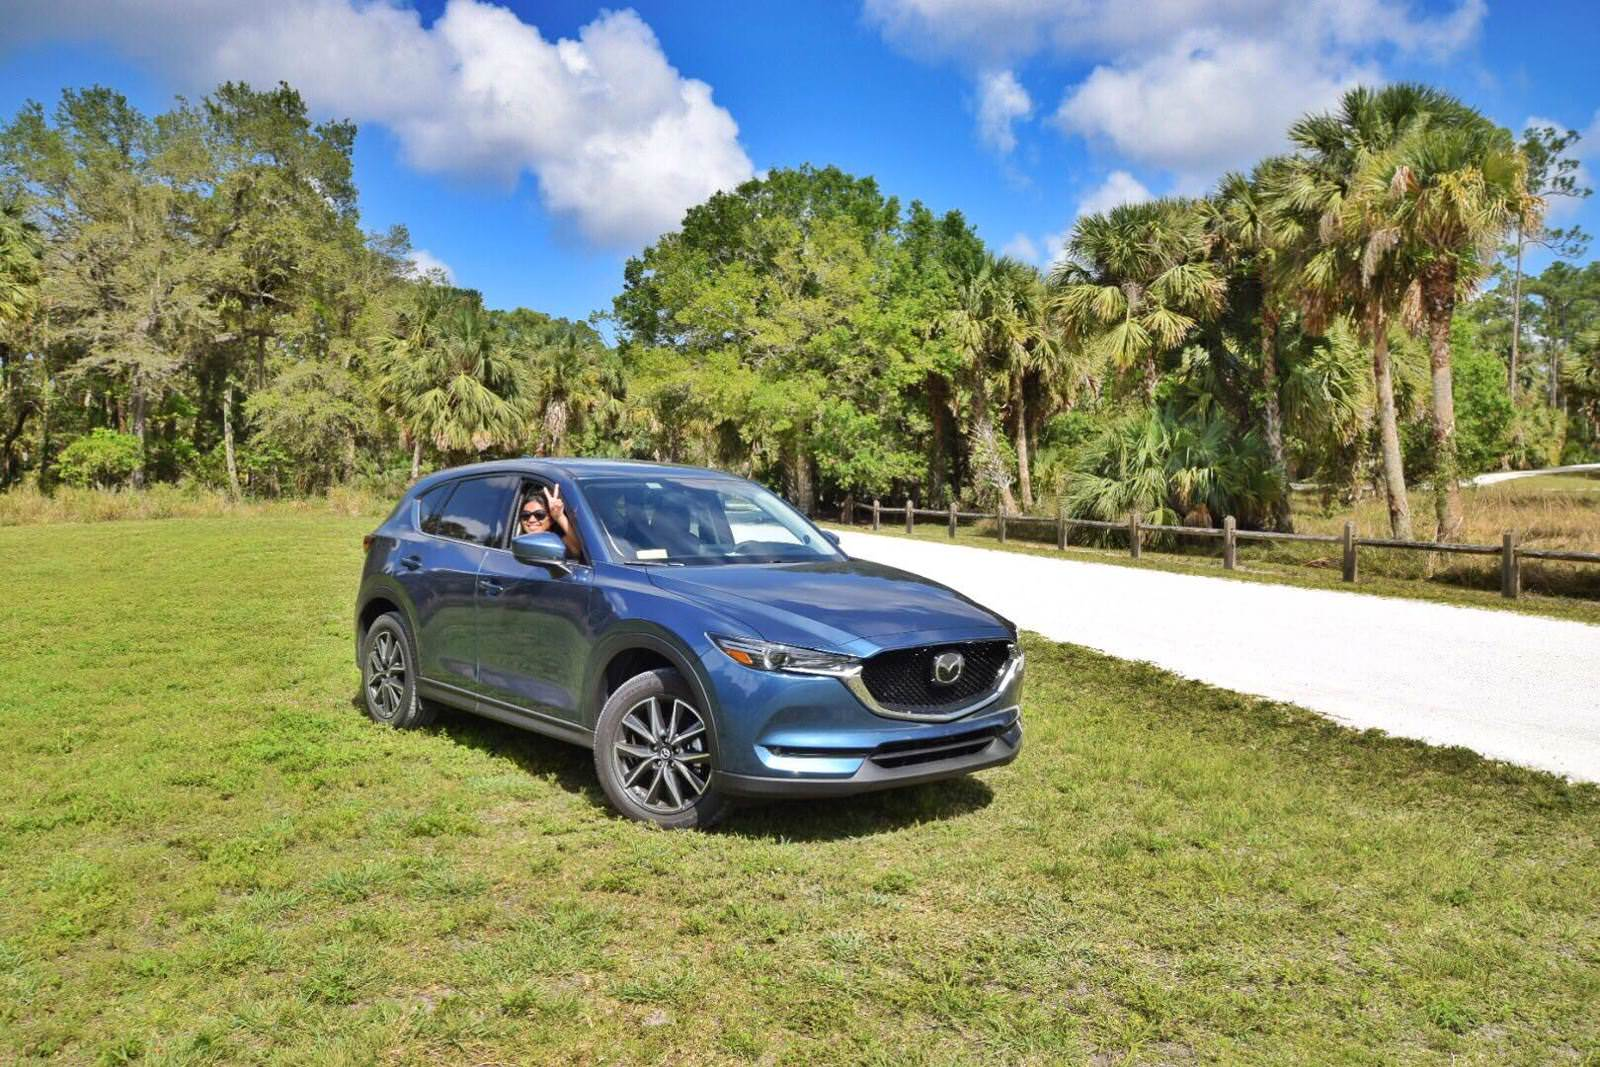 Palm Beaches Mazda CX-5